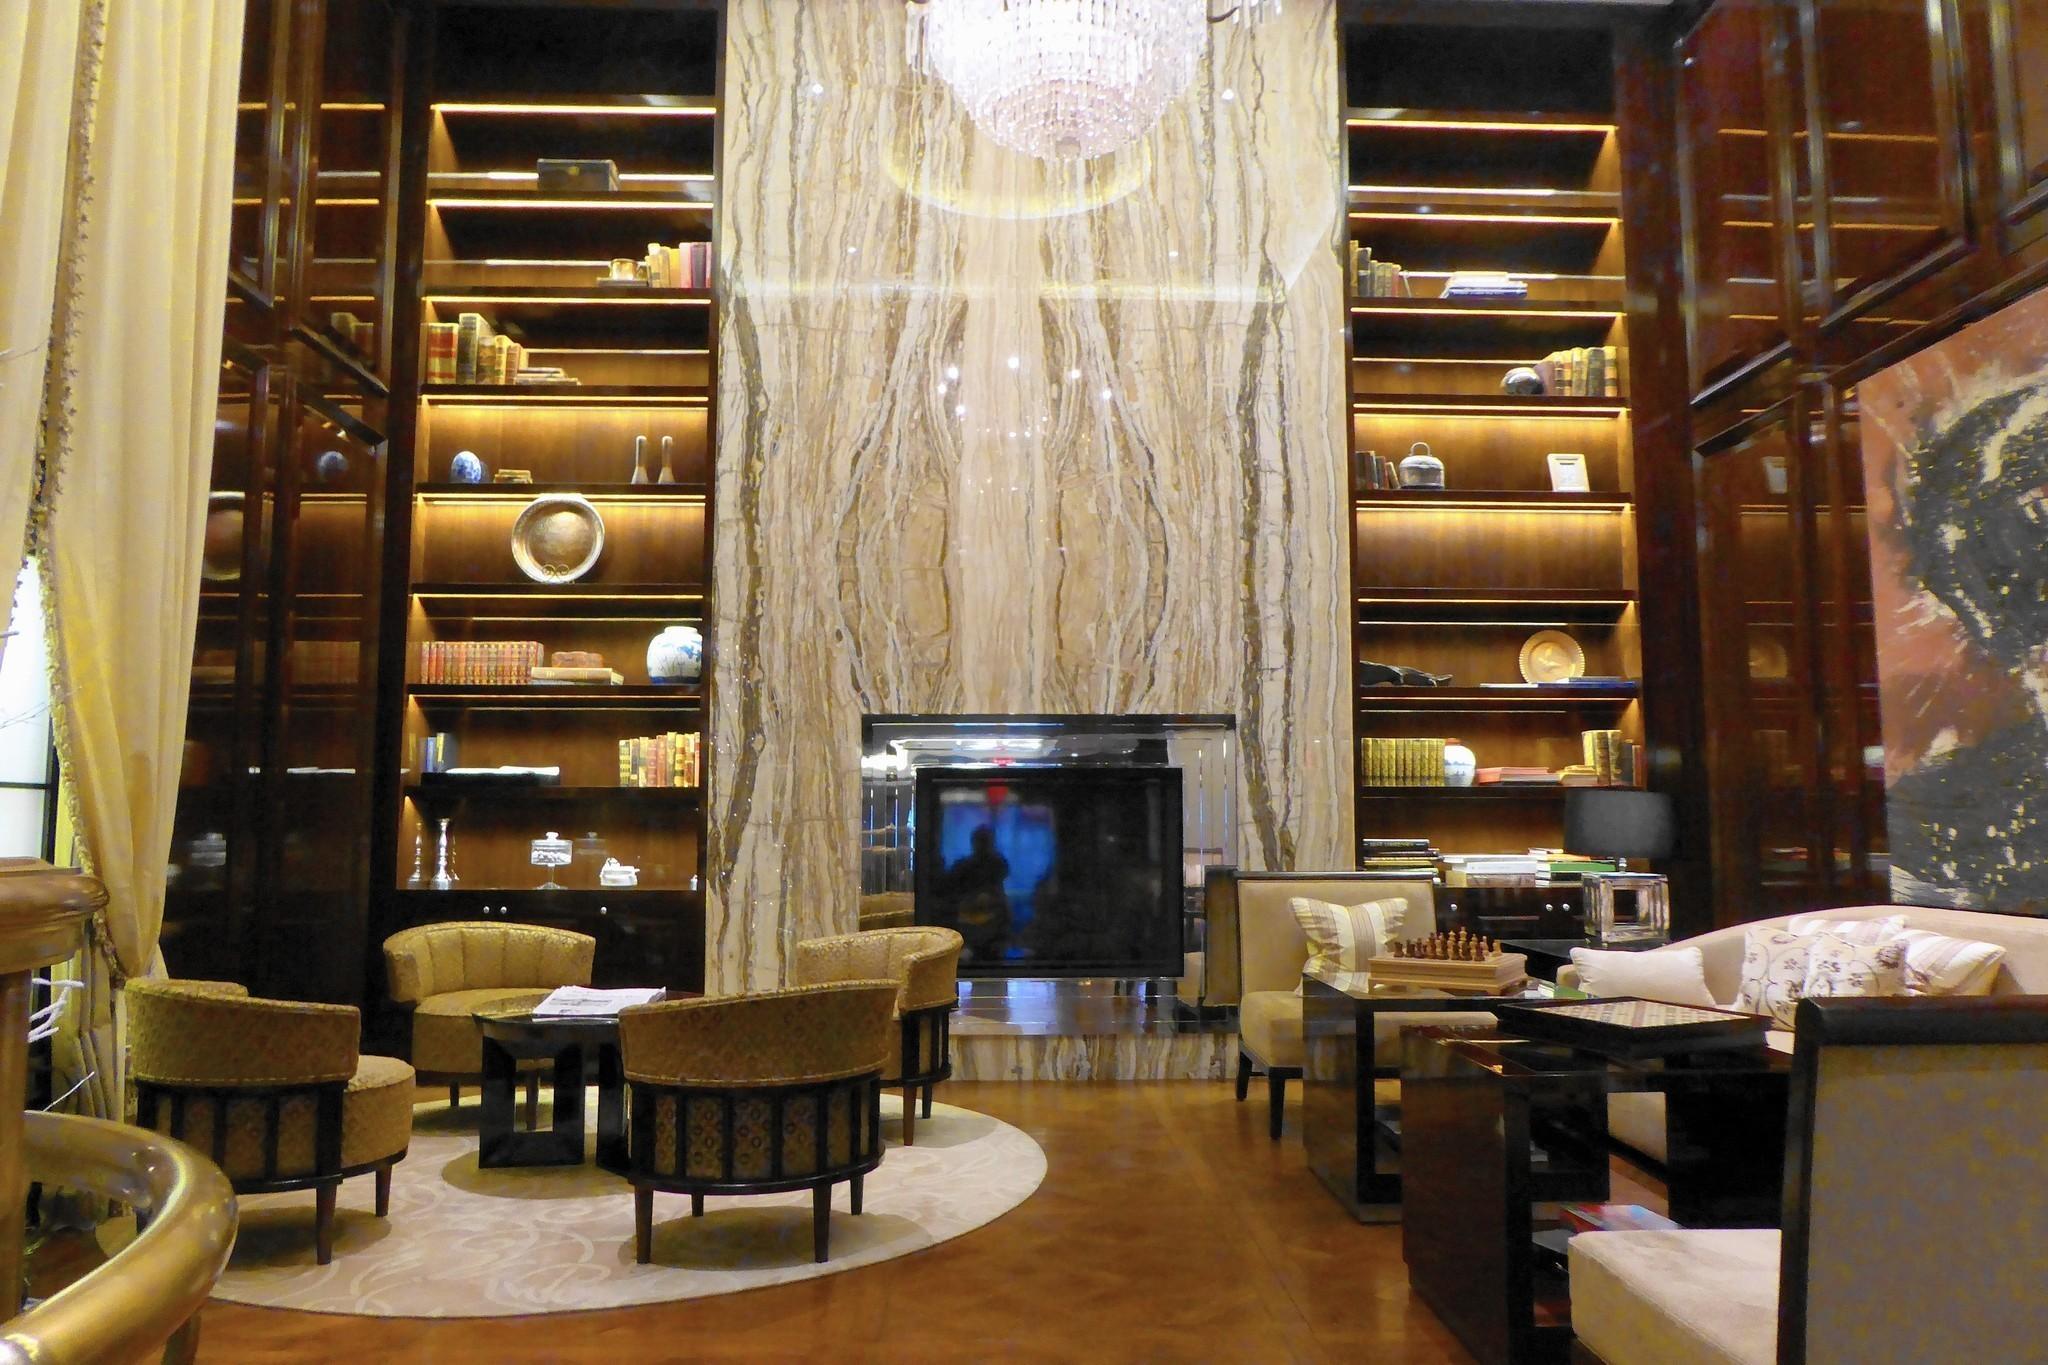 capella brings a posh hotel oasis to washington d c chicago